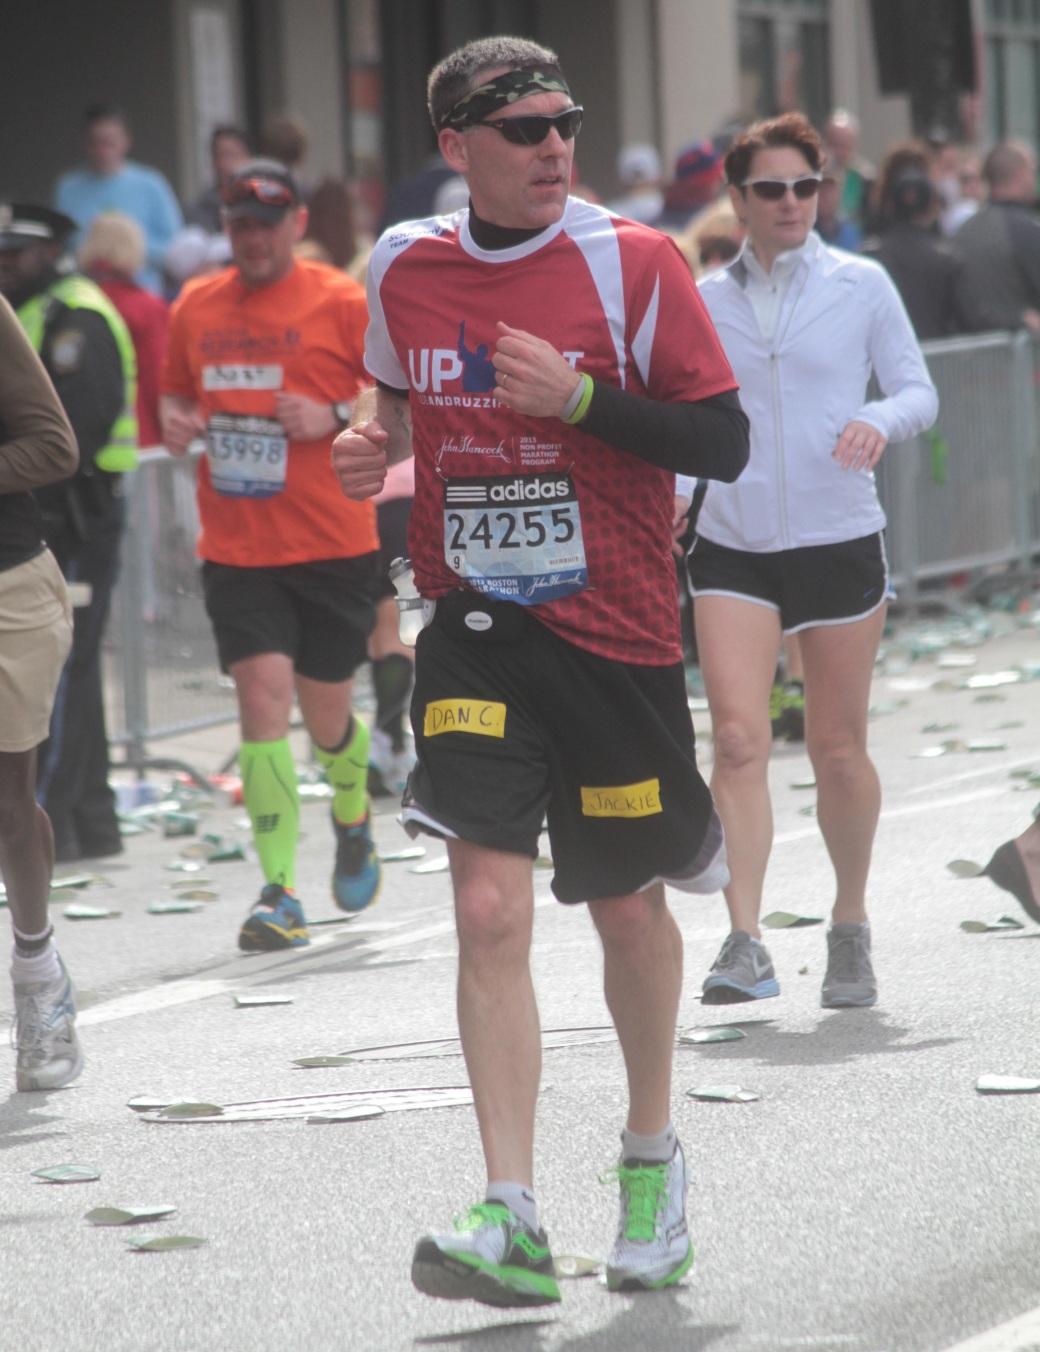 boston marathon 2013 number 24255